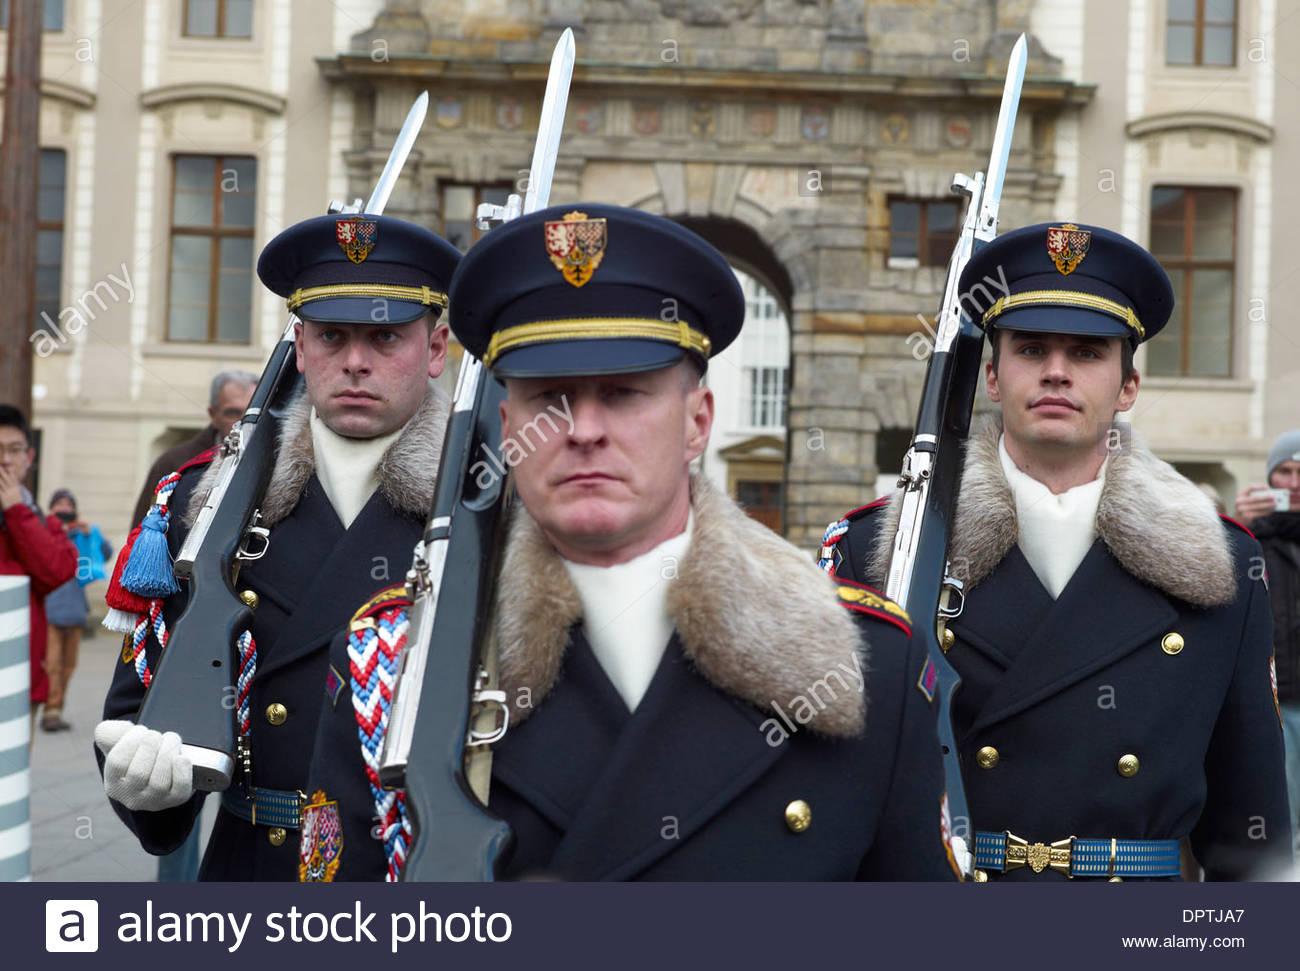 Castle Guards at Prague Castle or Hradcany seat of the czech president. Czech Republic - Stock Image